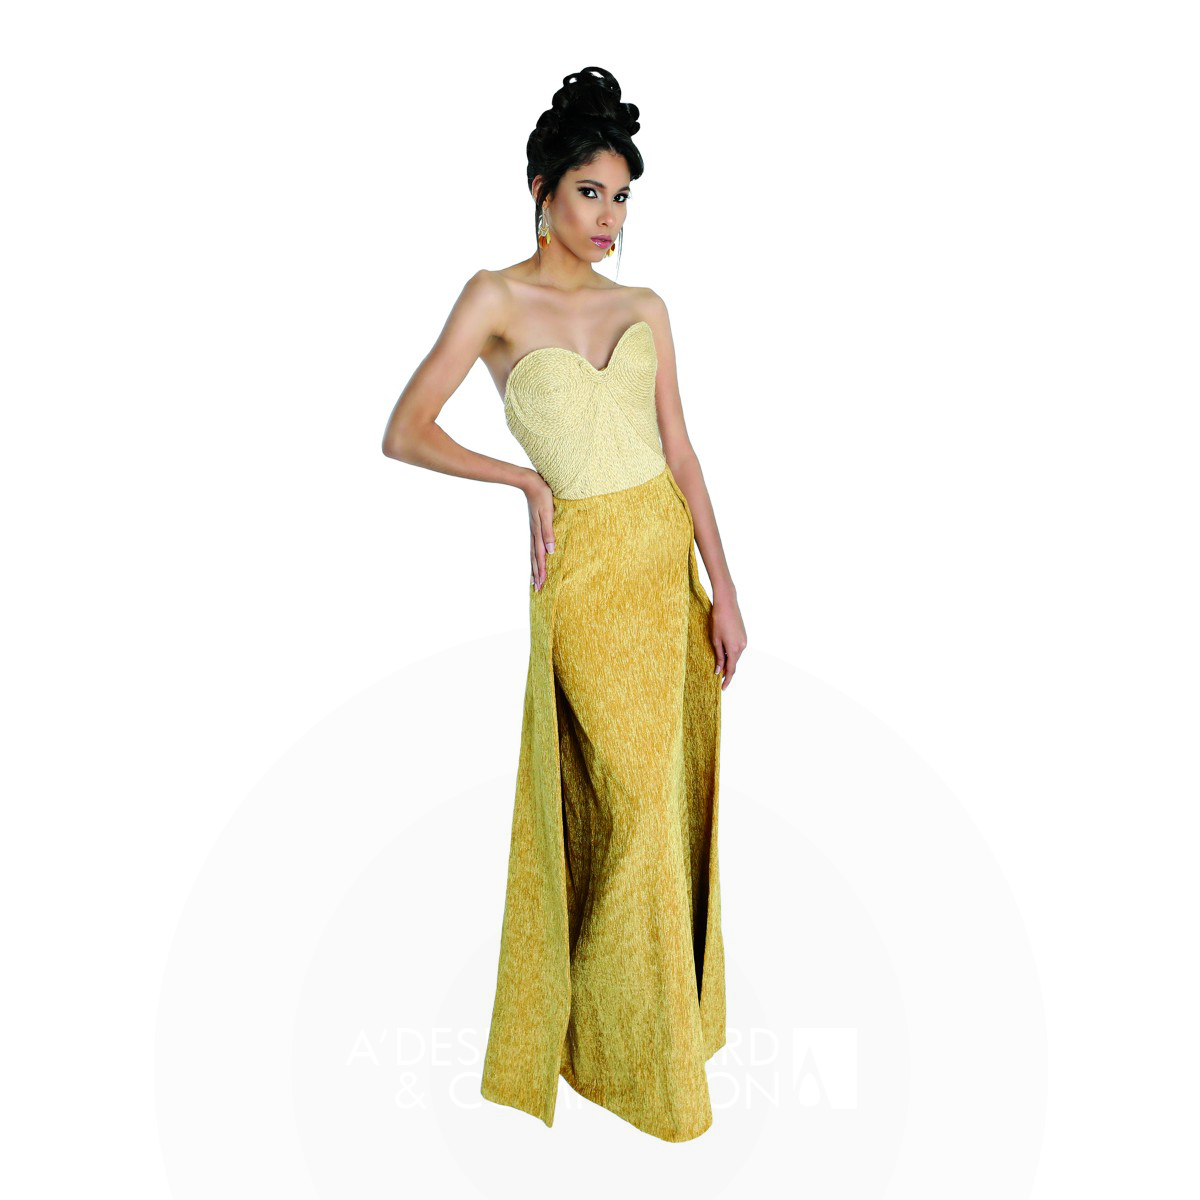 Camillet High Fashion Dress